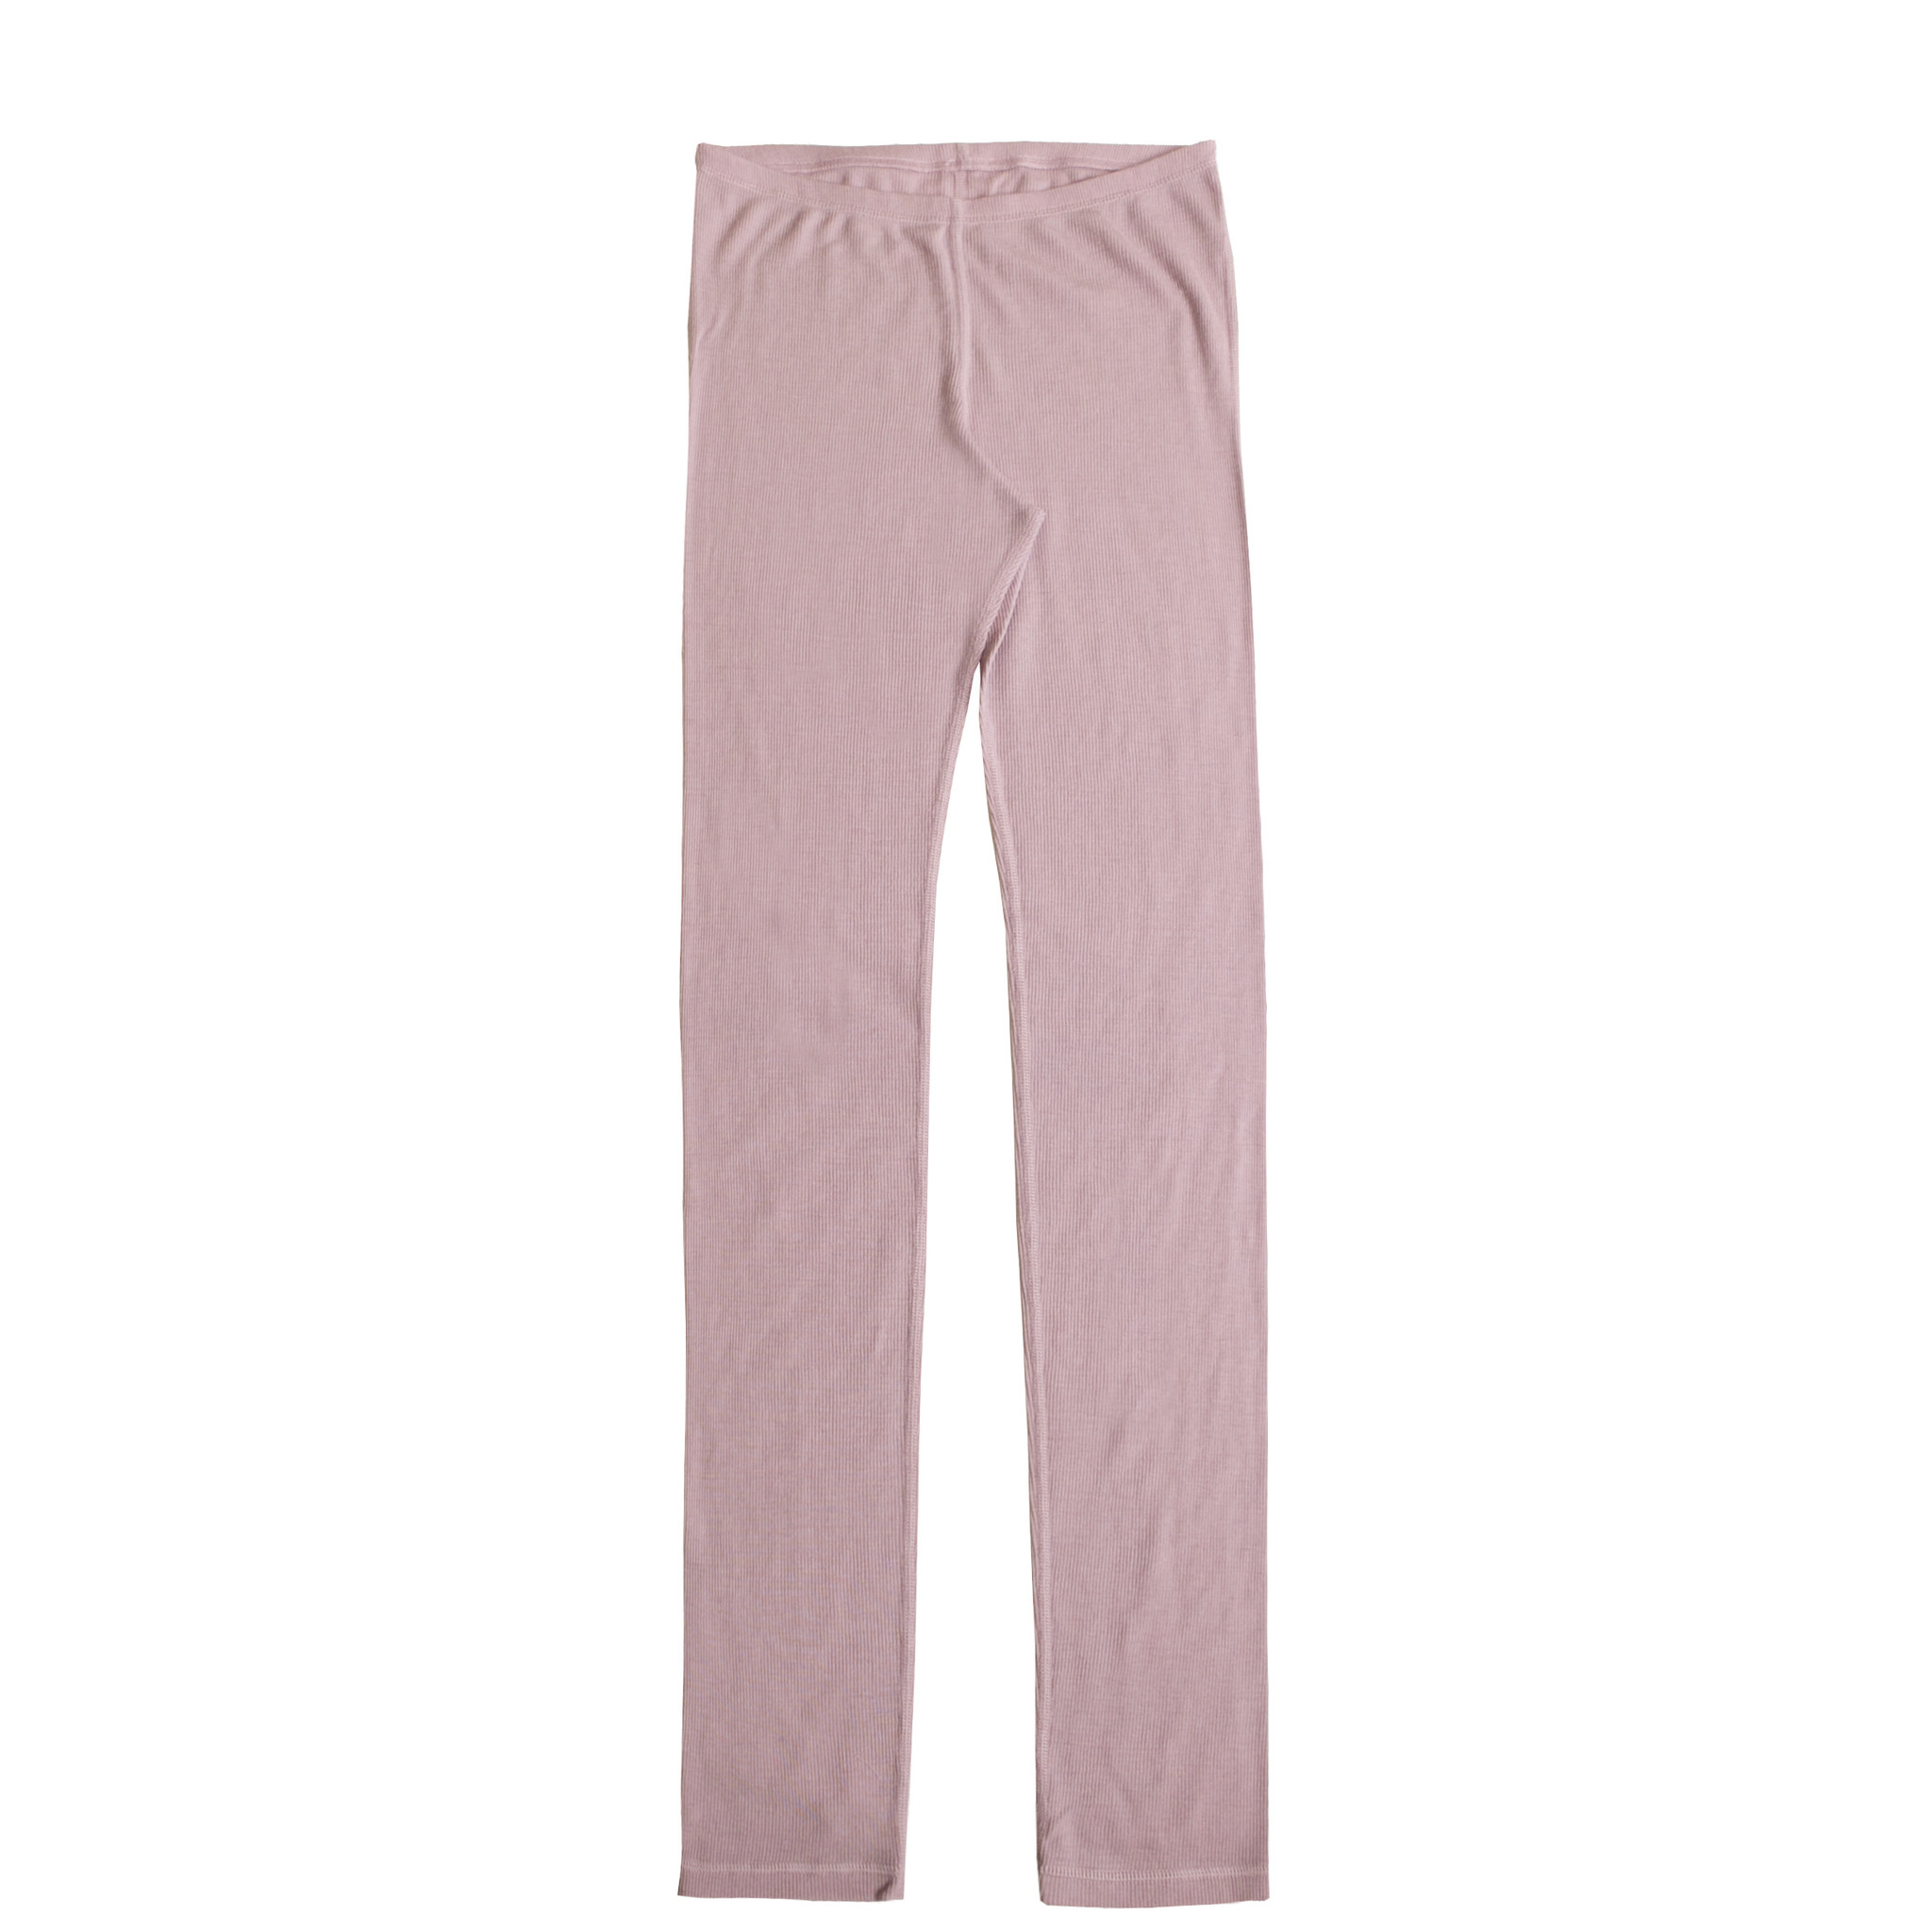 Legging - merino wool-5